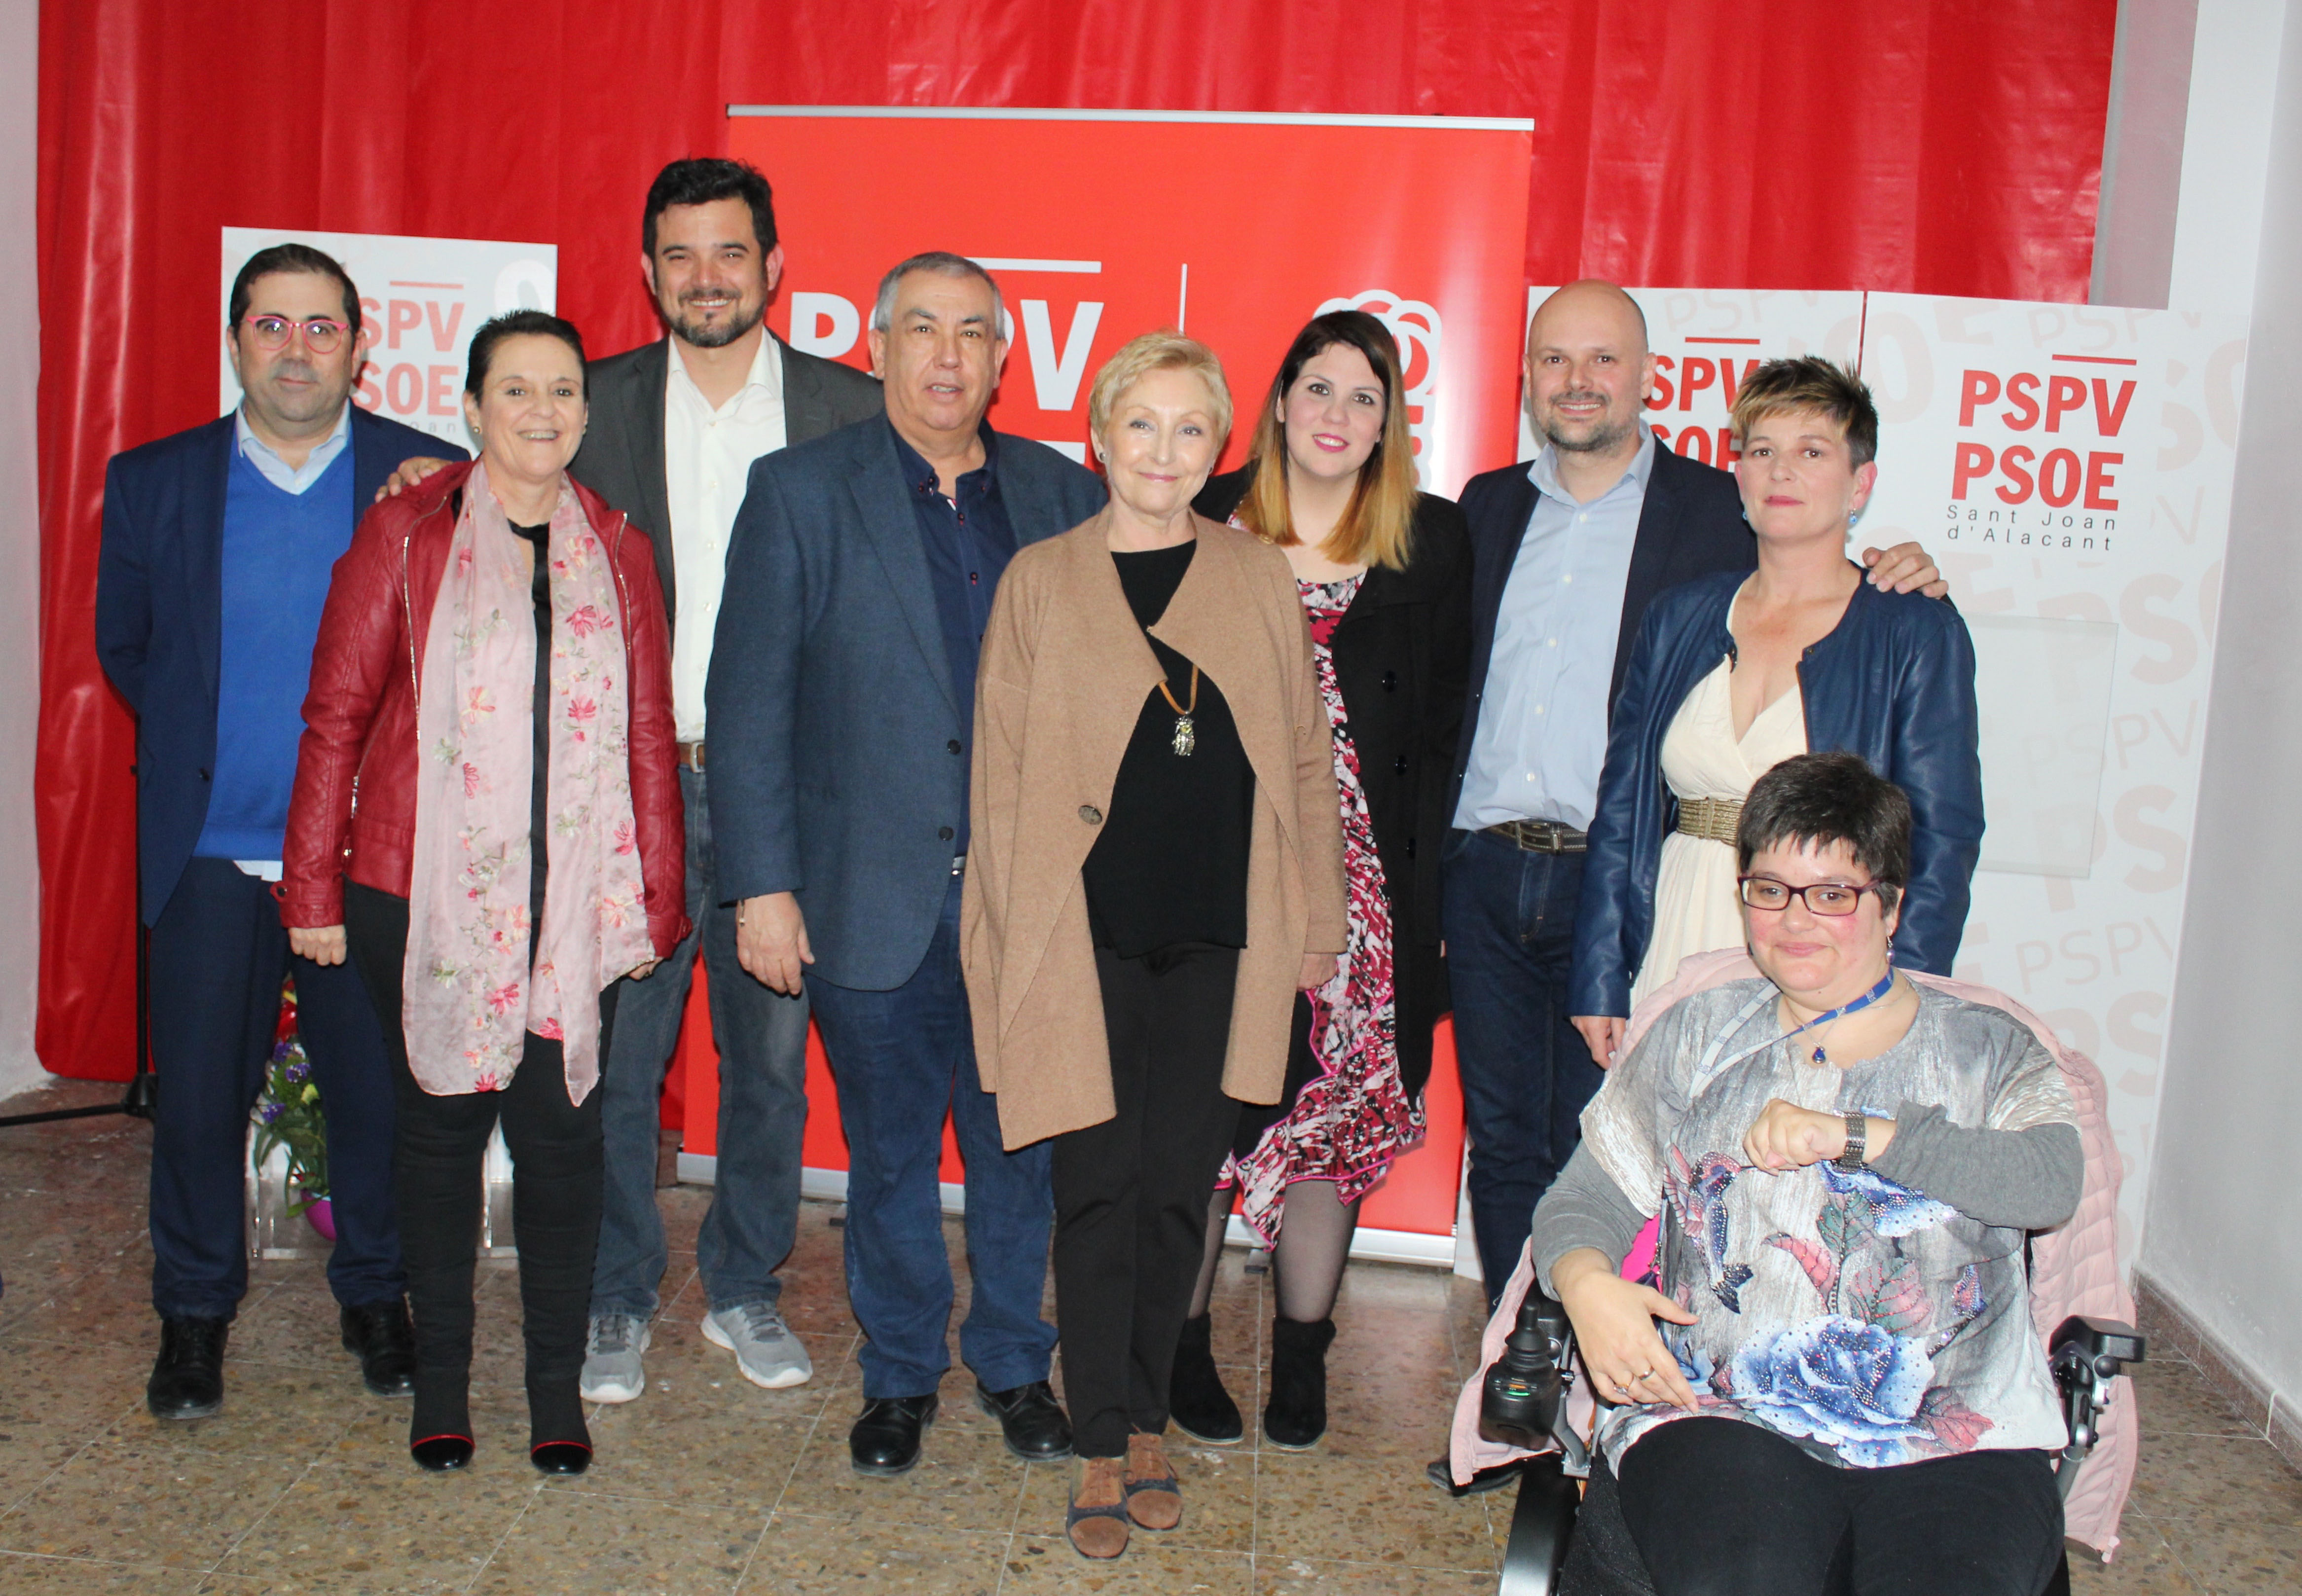 Inauguración sede PSPV-PSOE Sant Joan d'Alacant